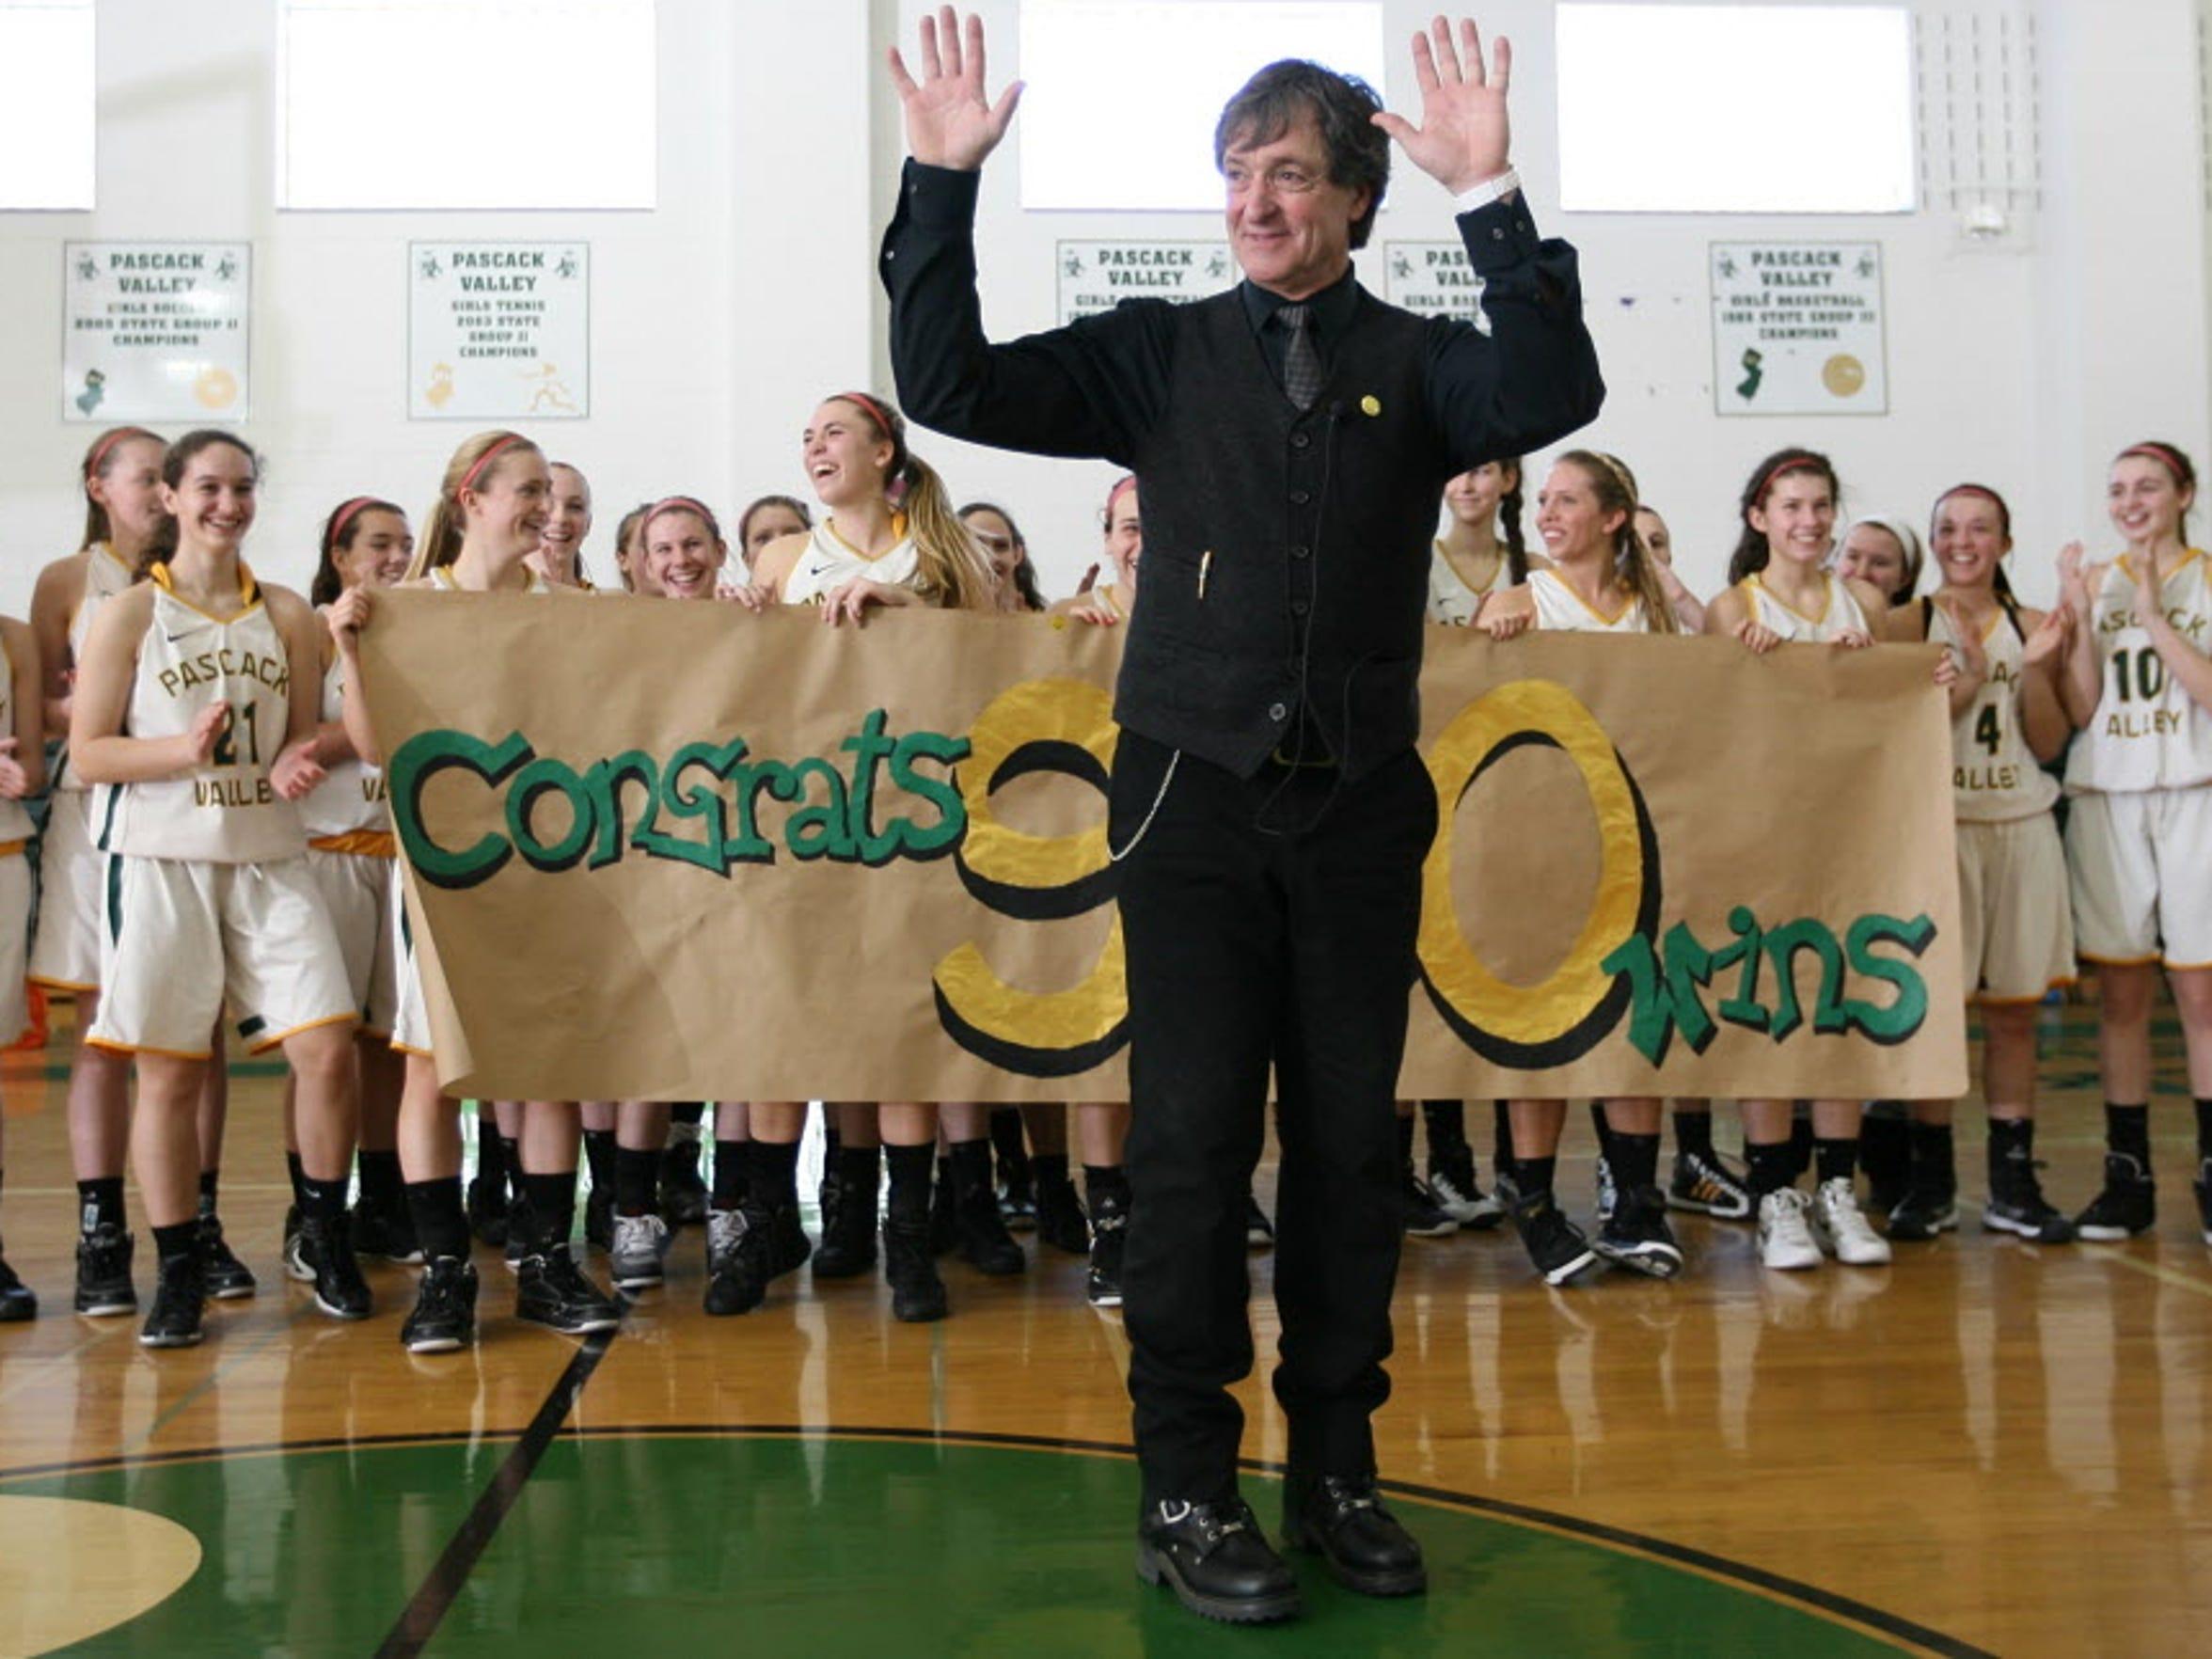 Pascack Valley girls basketball coach Jeff Jasper celebrates his 900th career win Jan. 26, 2013.